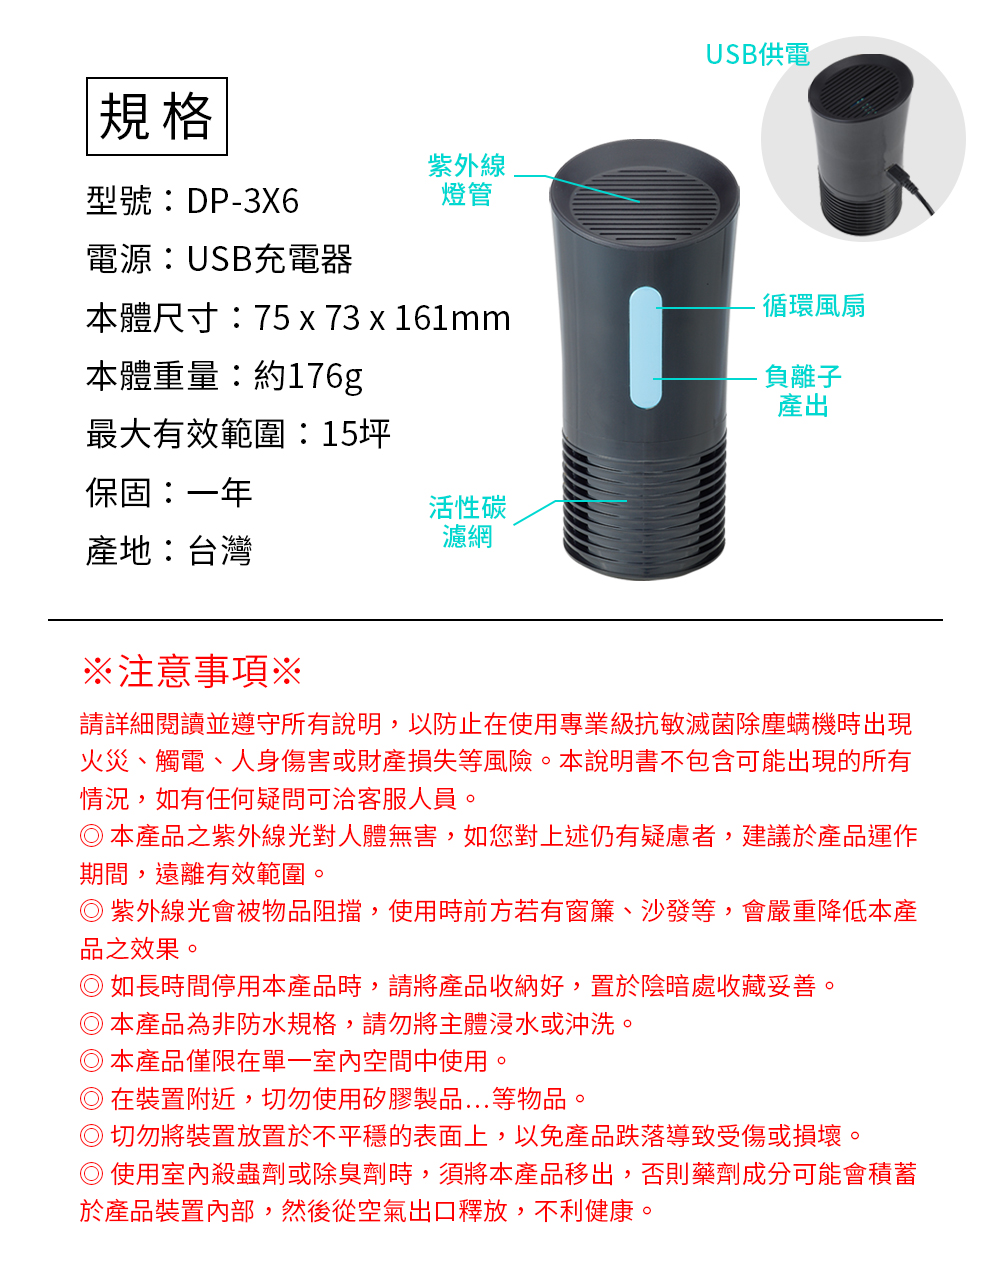 DigiMax★DP-3X6 侍衛級超淨化空氣清淨除塵螨機